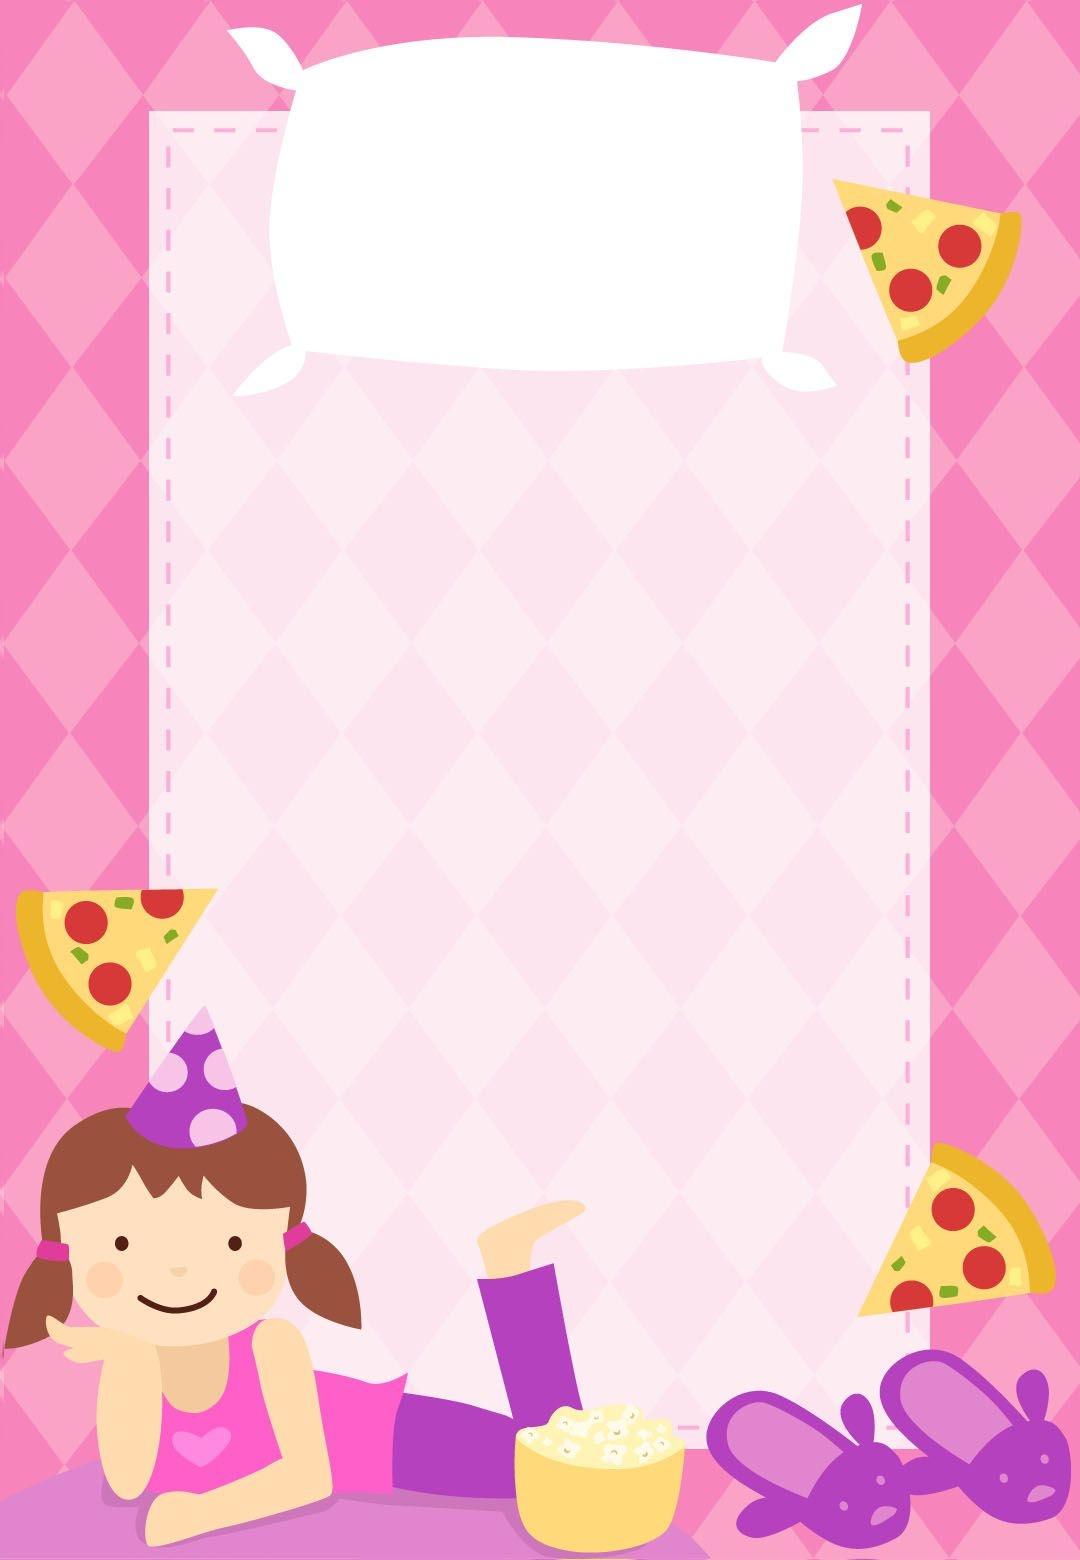 Free Printable Sleepover Party Invitation Customizable Too - Free Printable Spa Party Invitations Templates